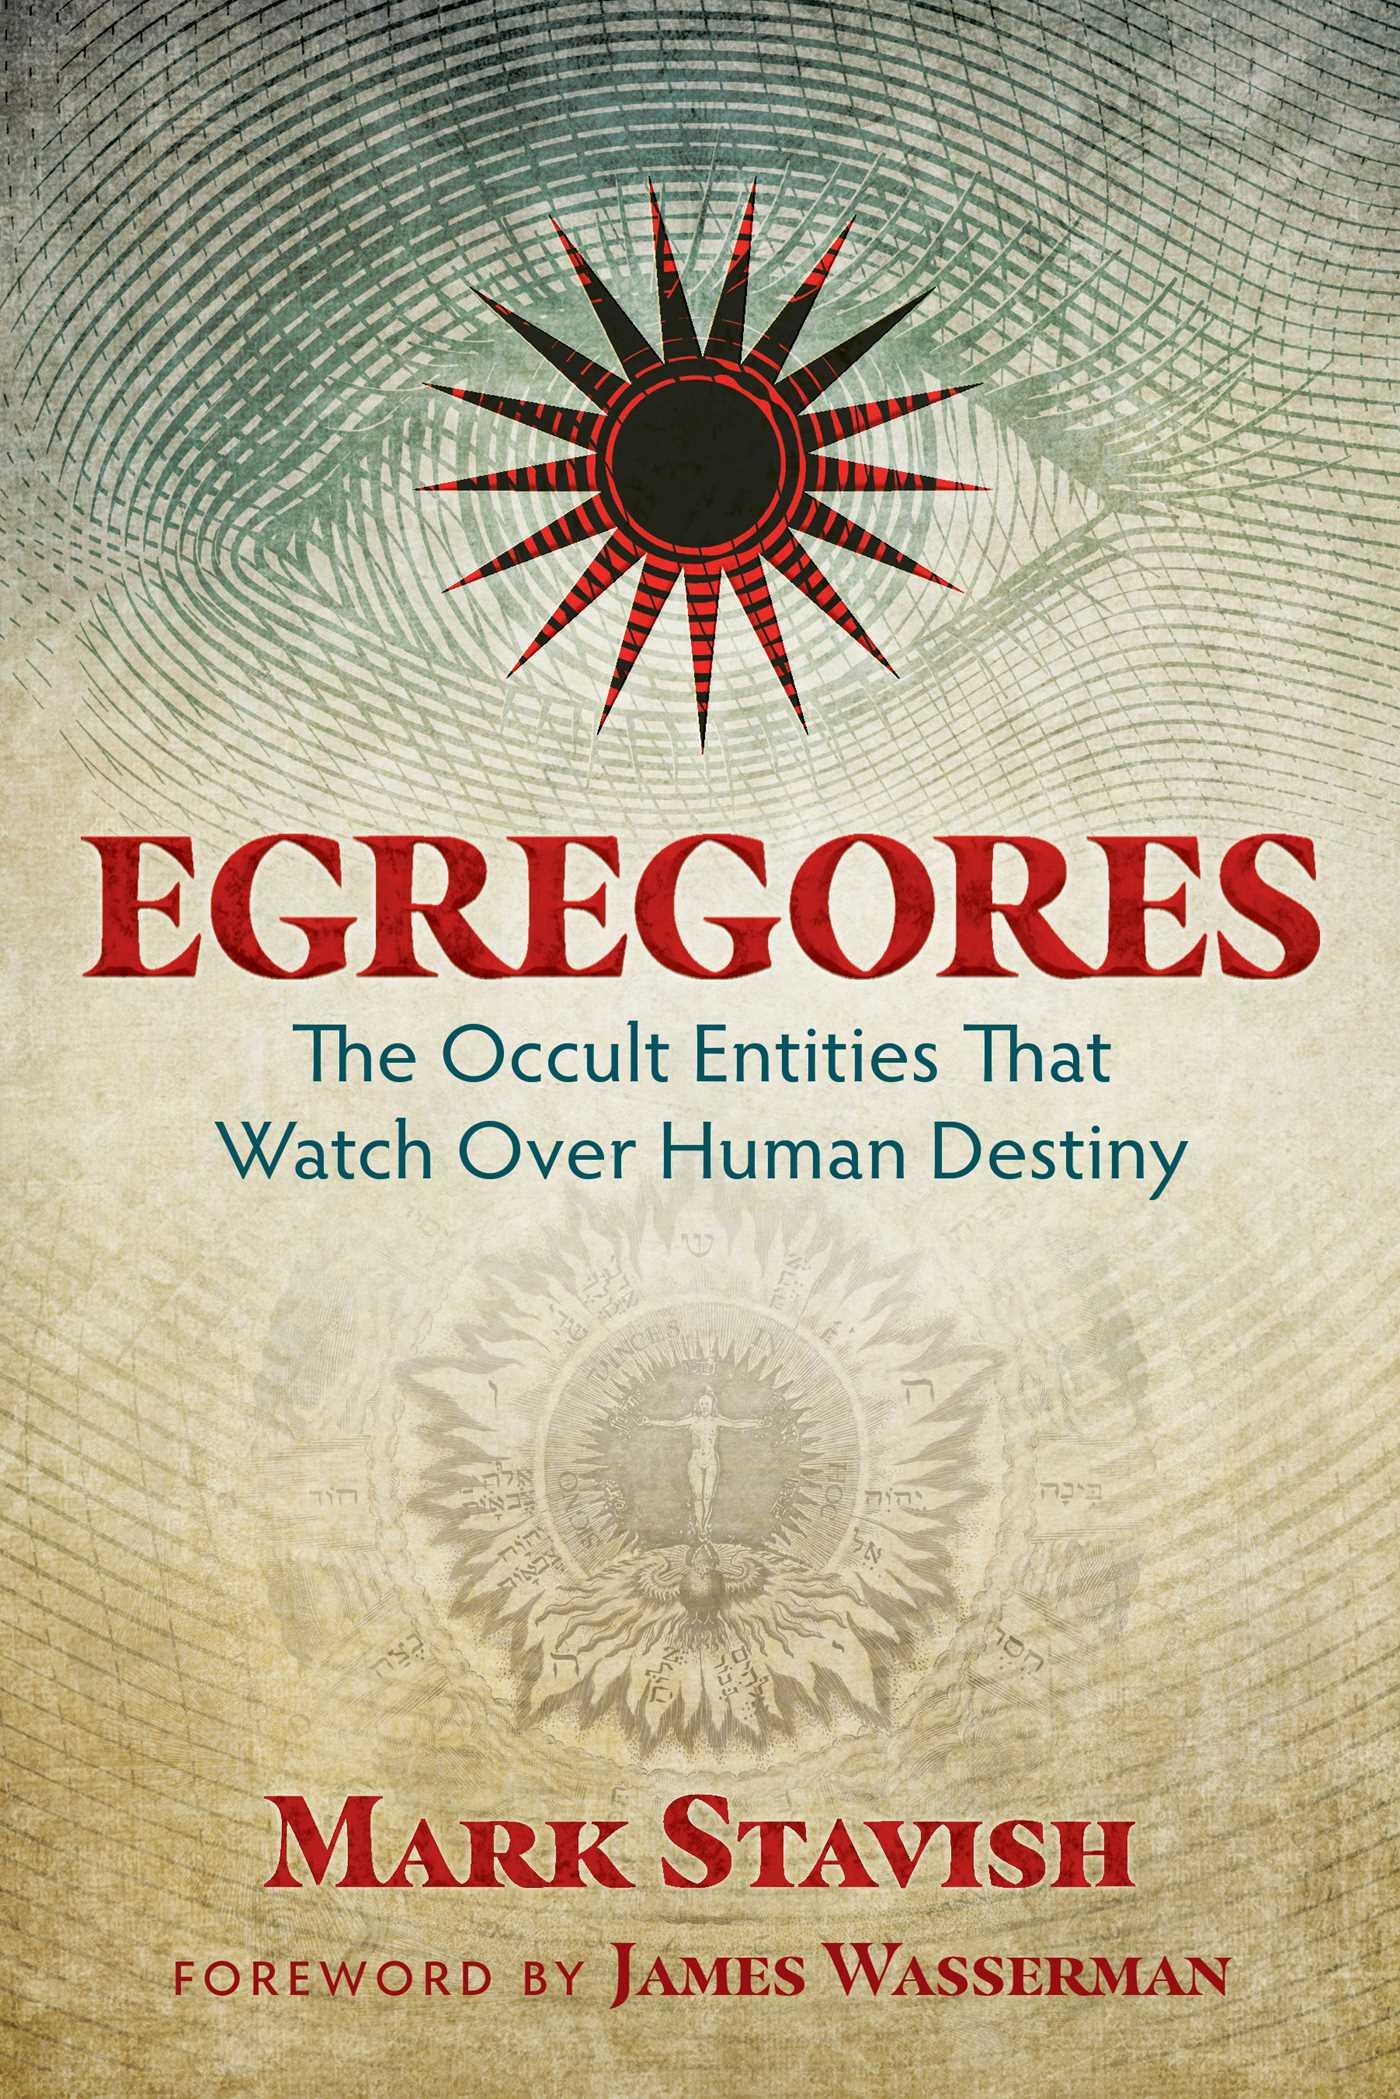 Egregores 9781620555774 hr